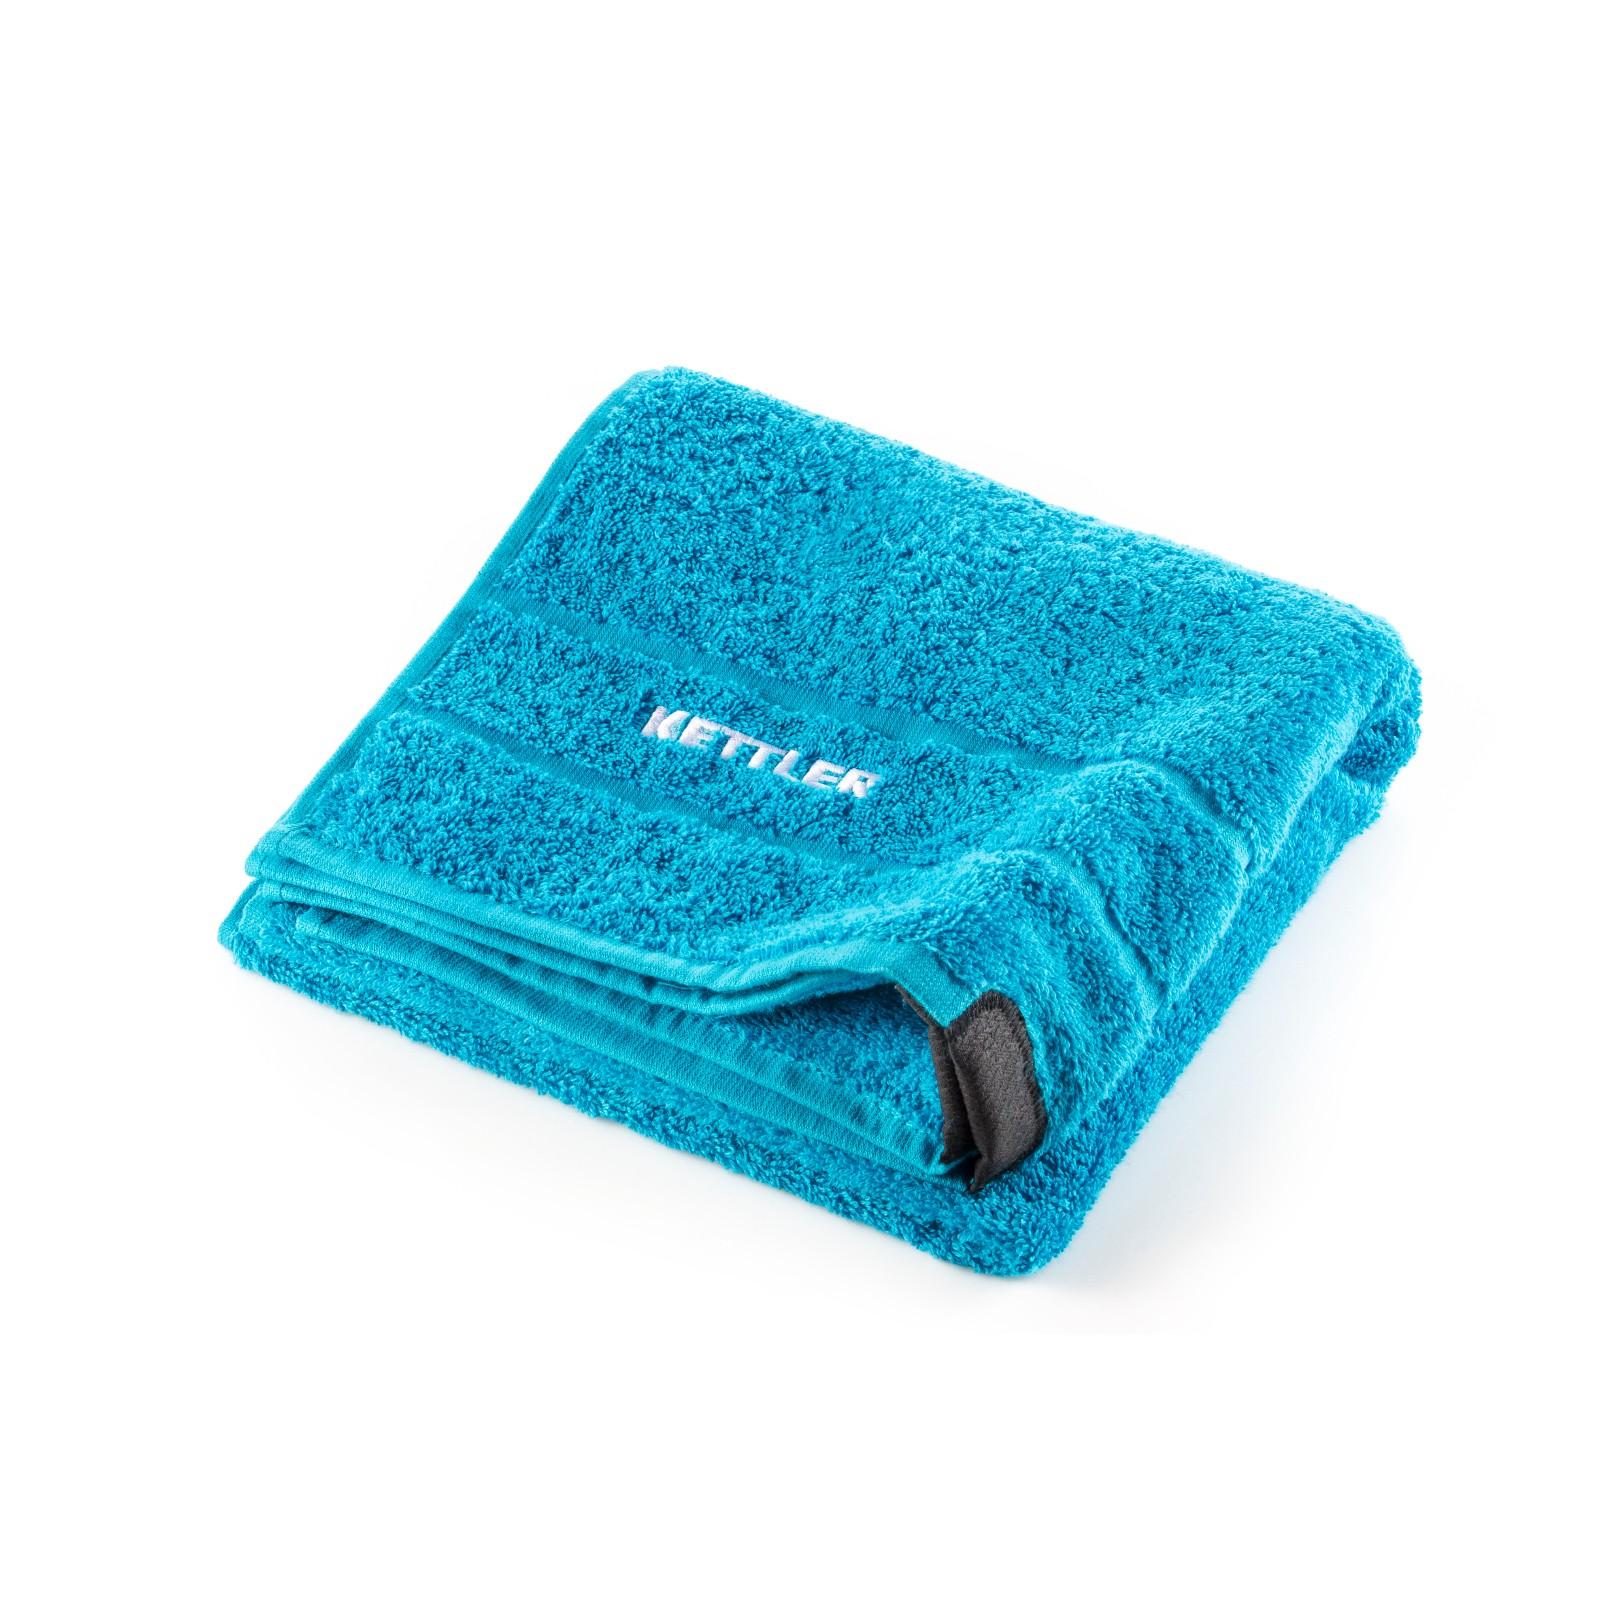 kettler fitness towel europe 39 s no 1 for home fitness. Black Bedroom Furniture Sets. Home Design Ideas